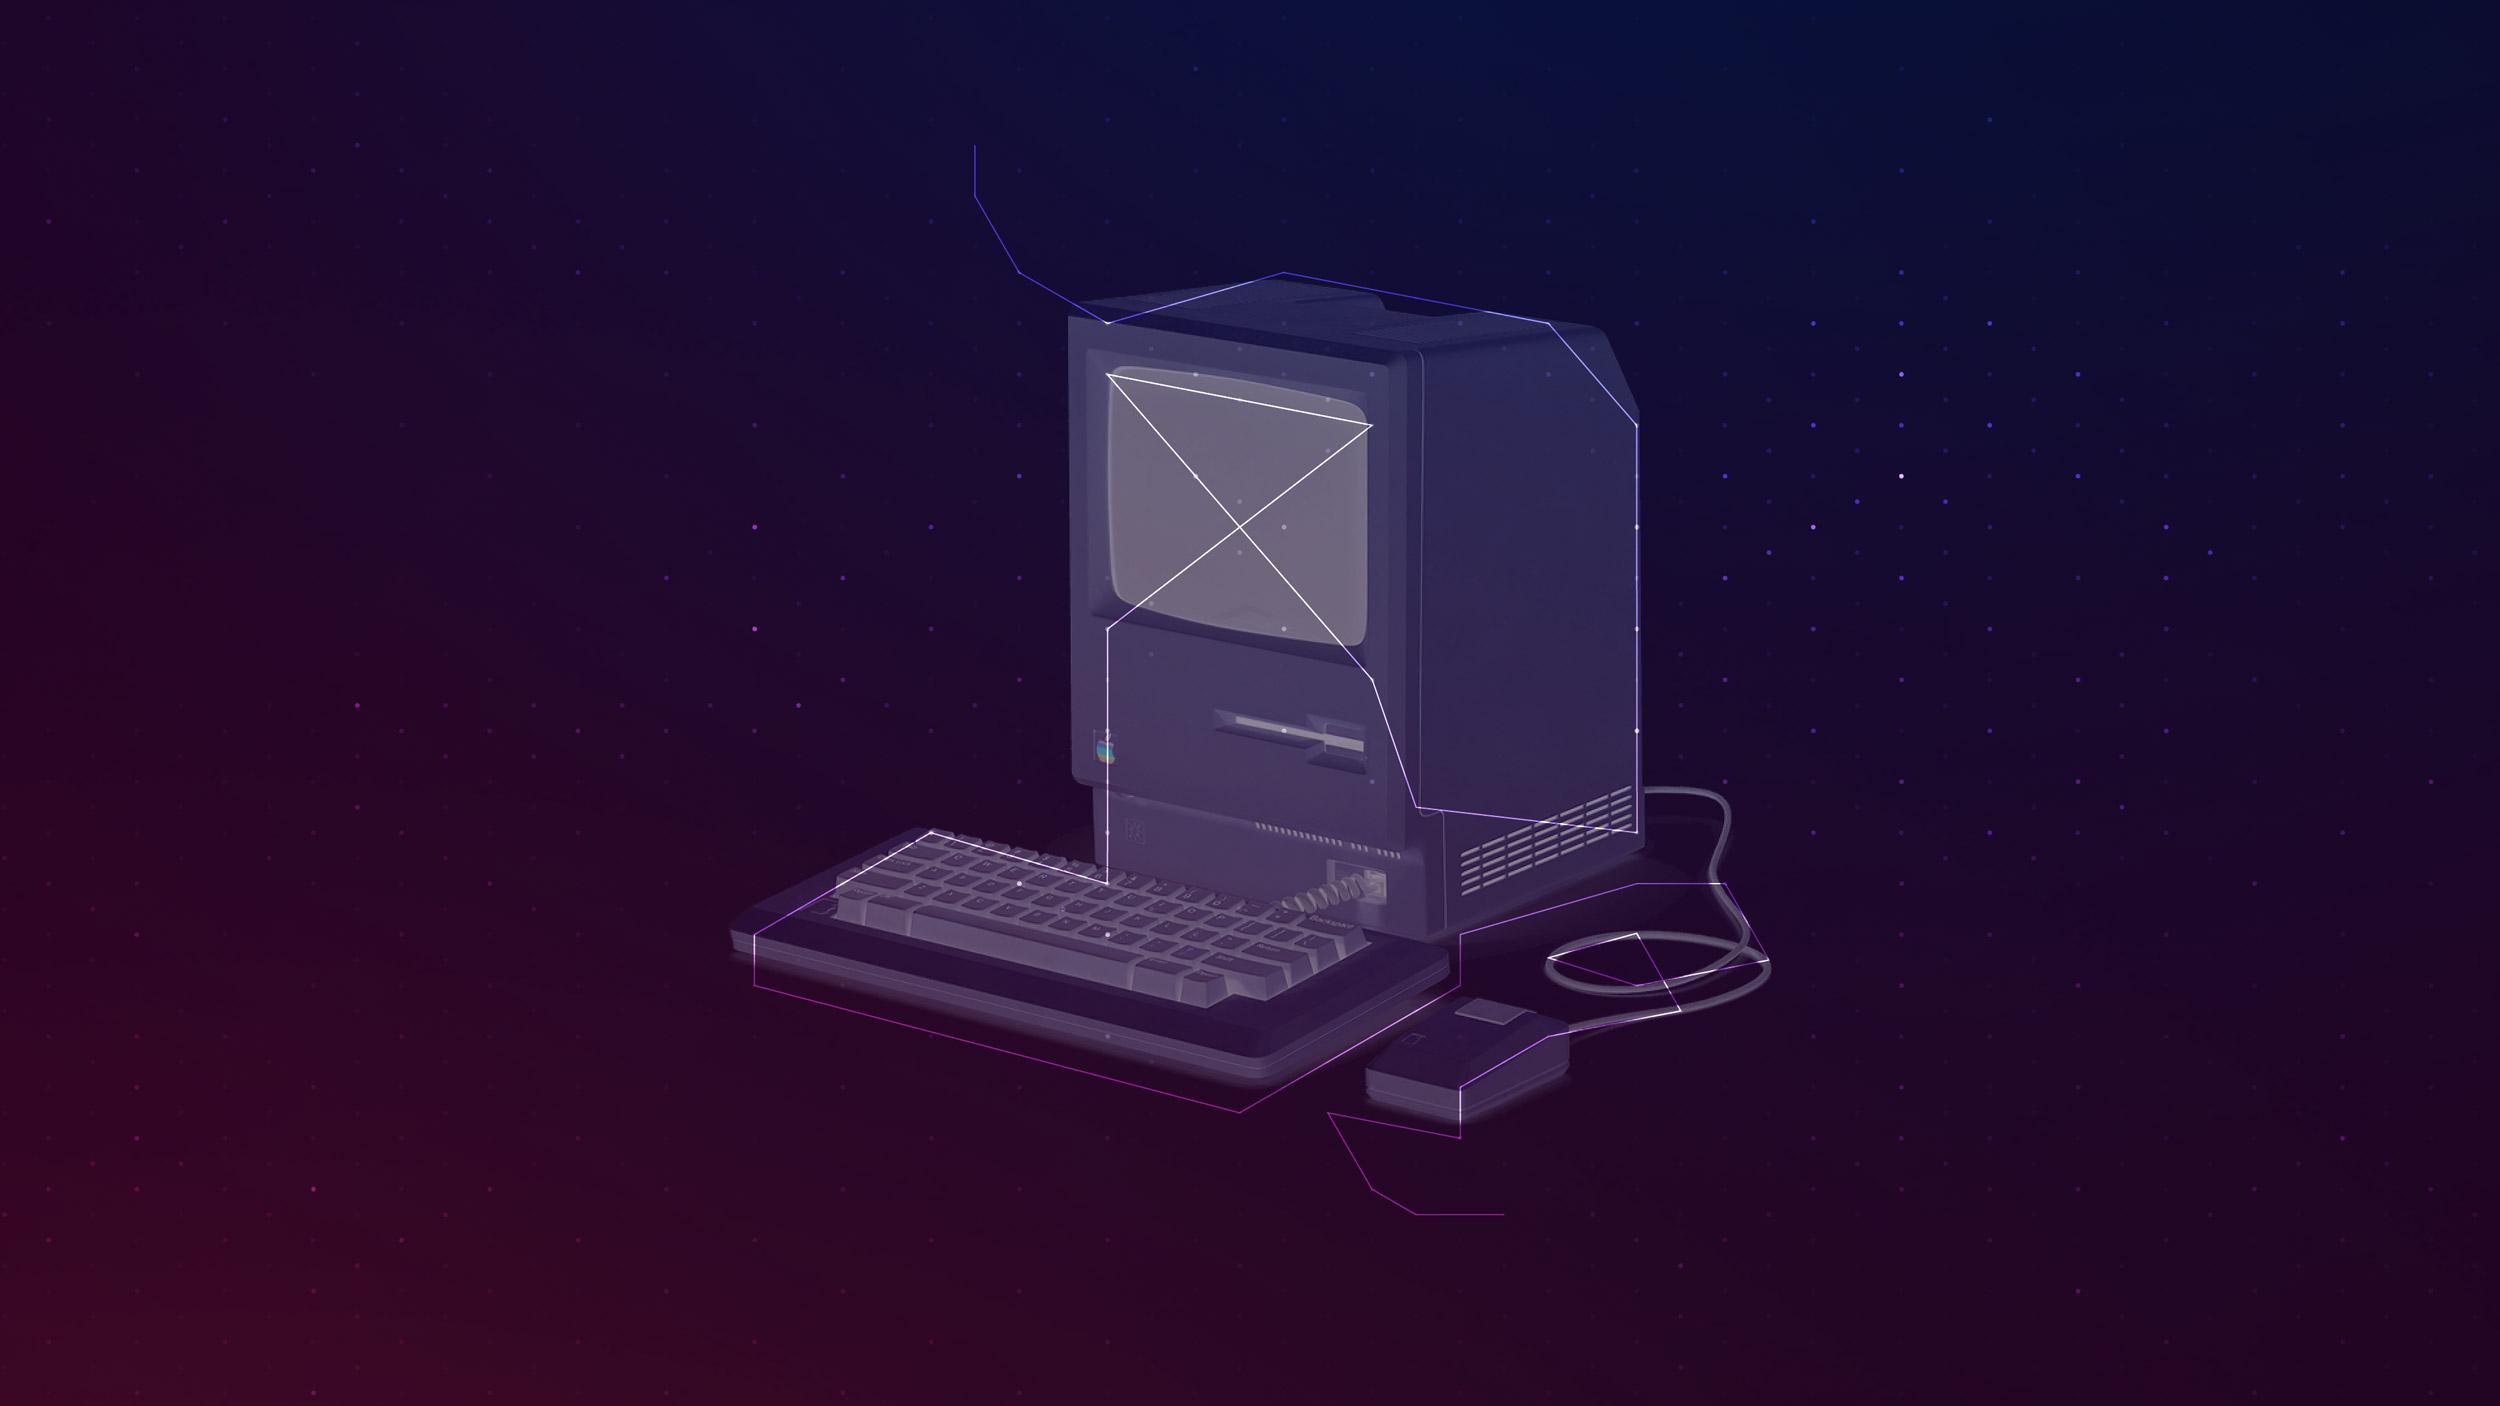 meng-he-brewgorithm-slide-computer